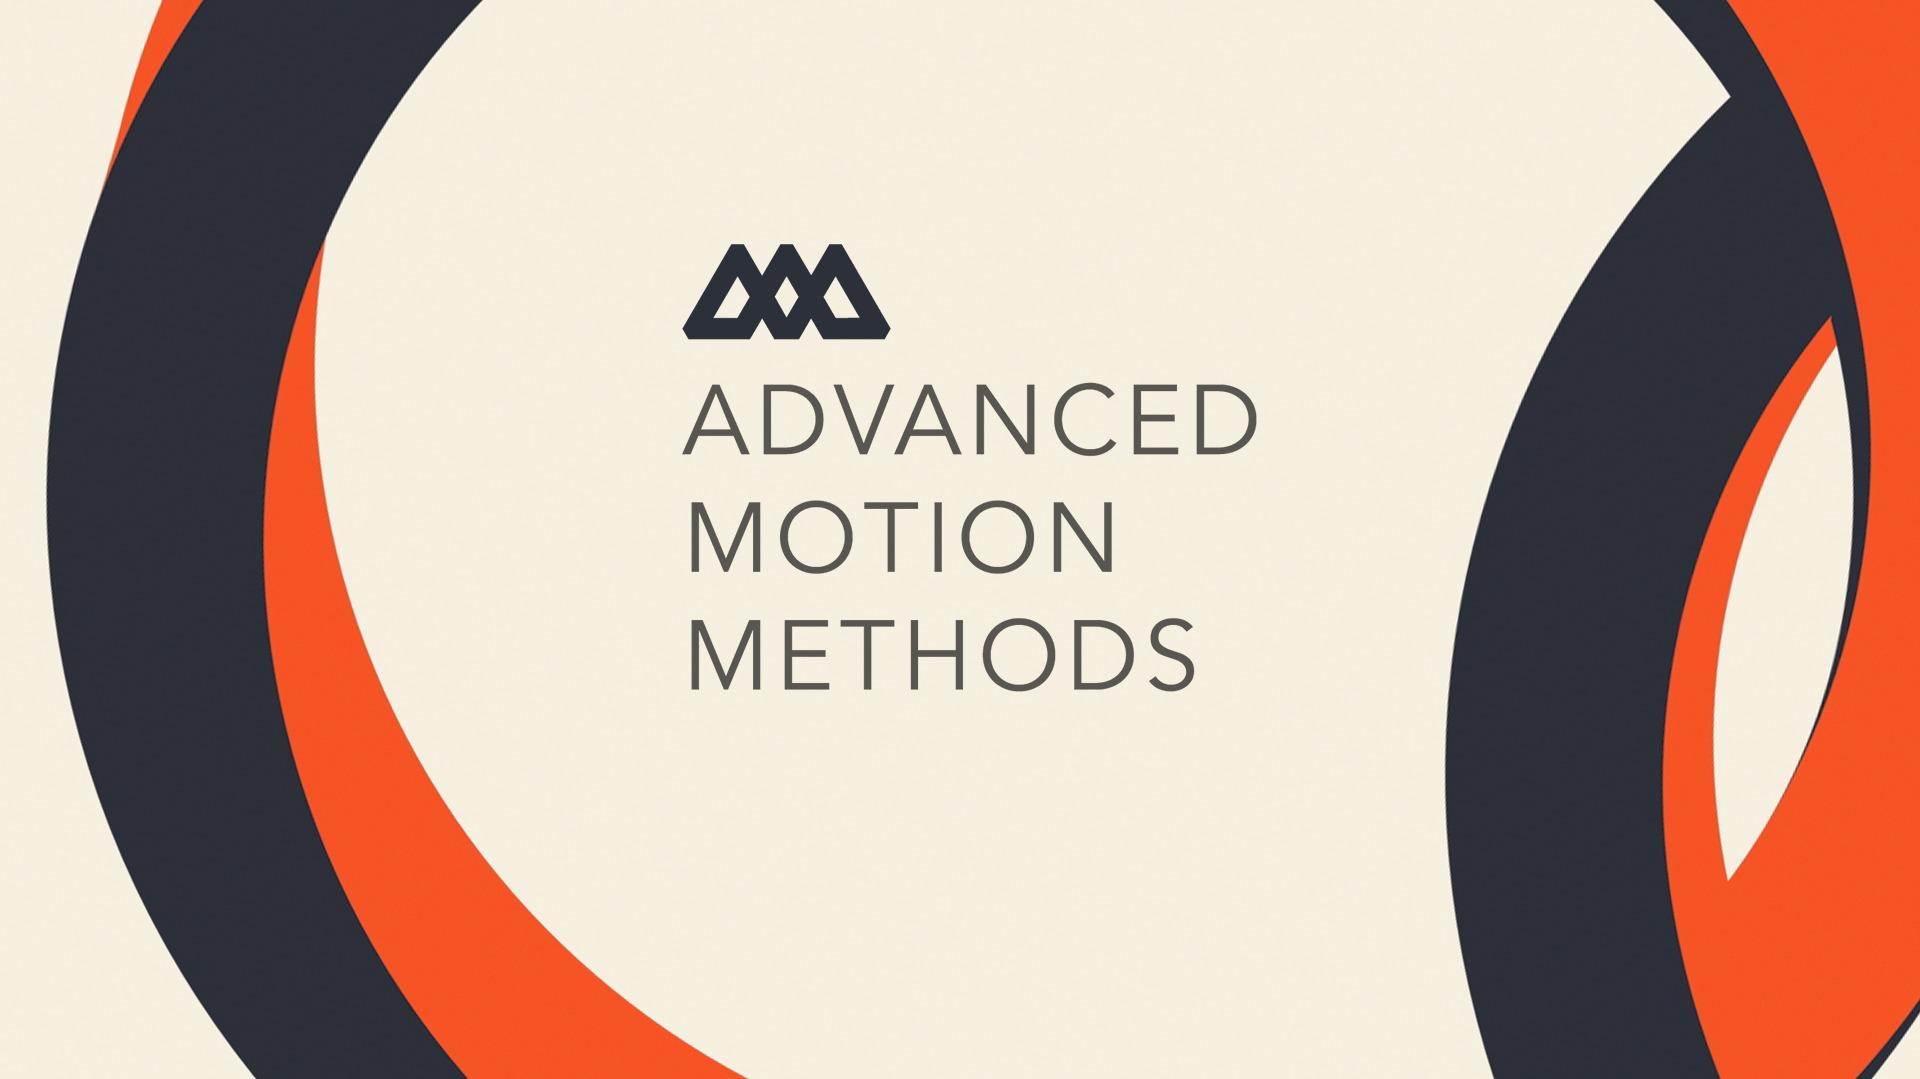 Advanced Motion Methods